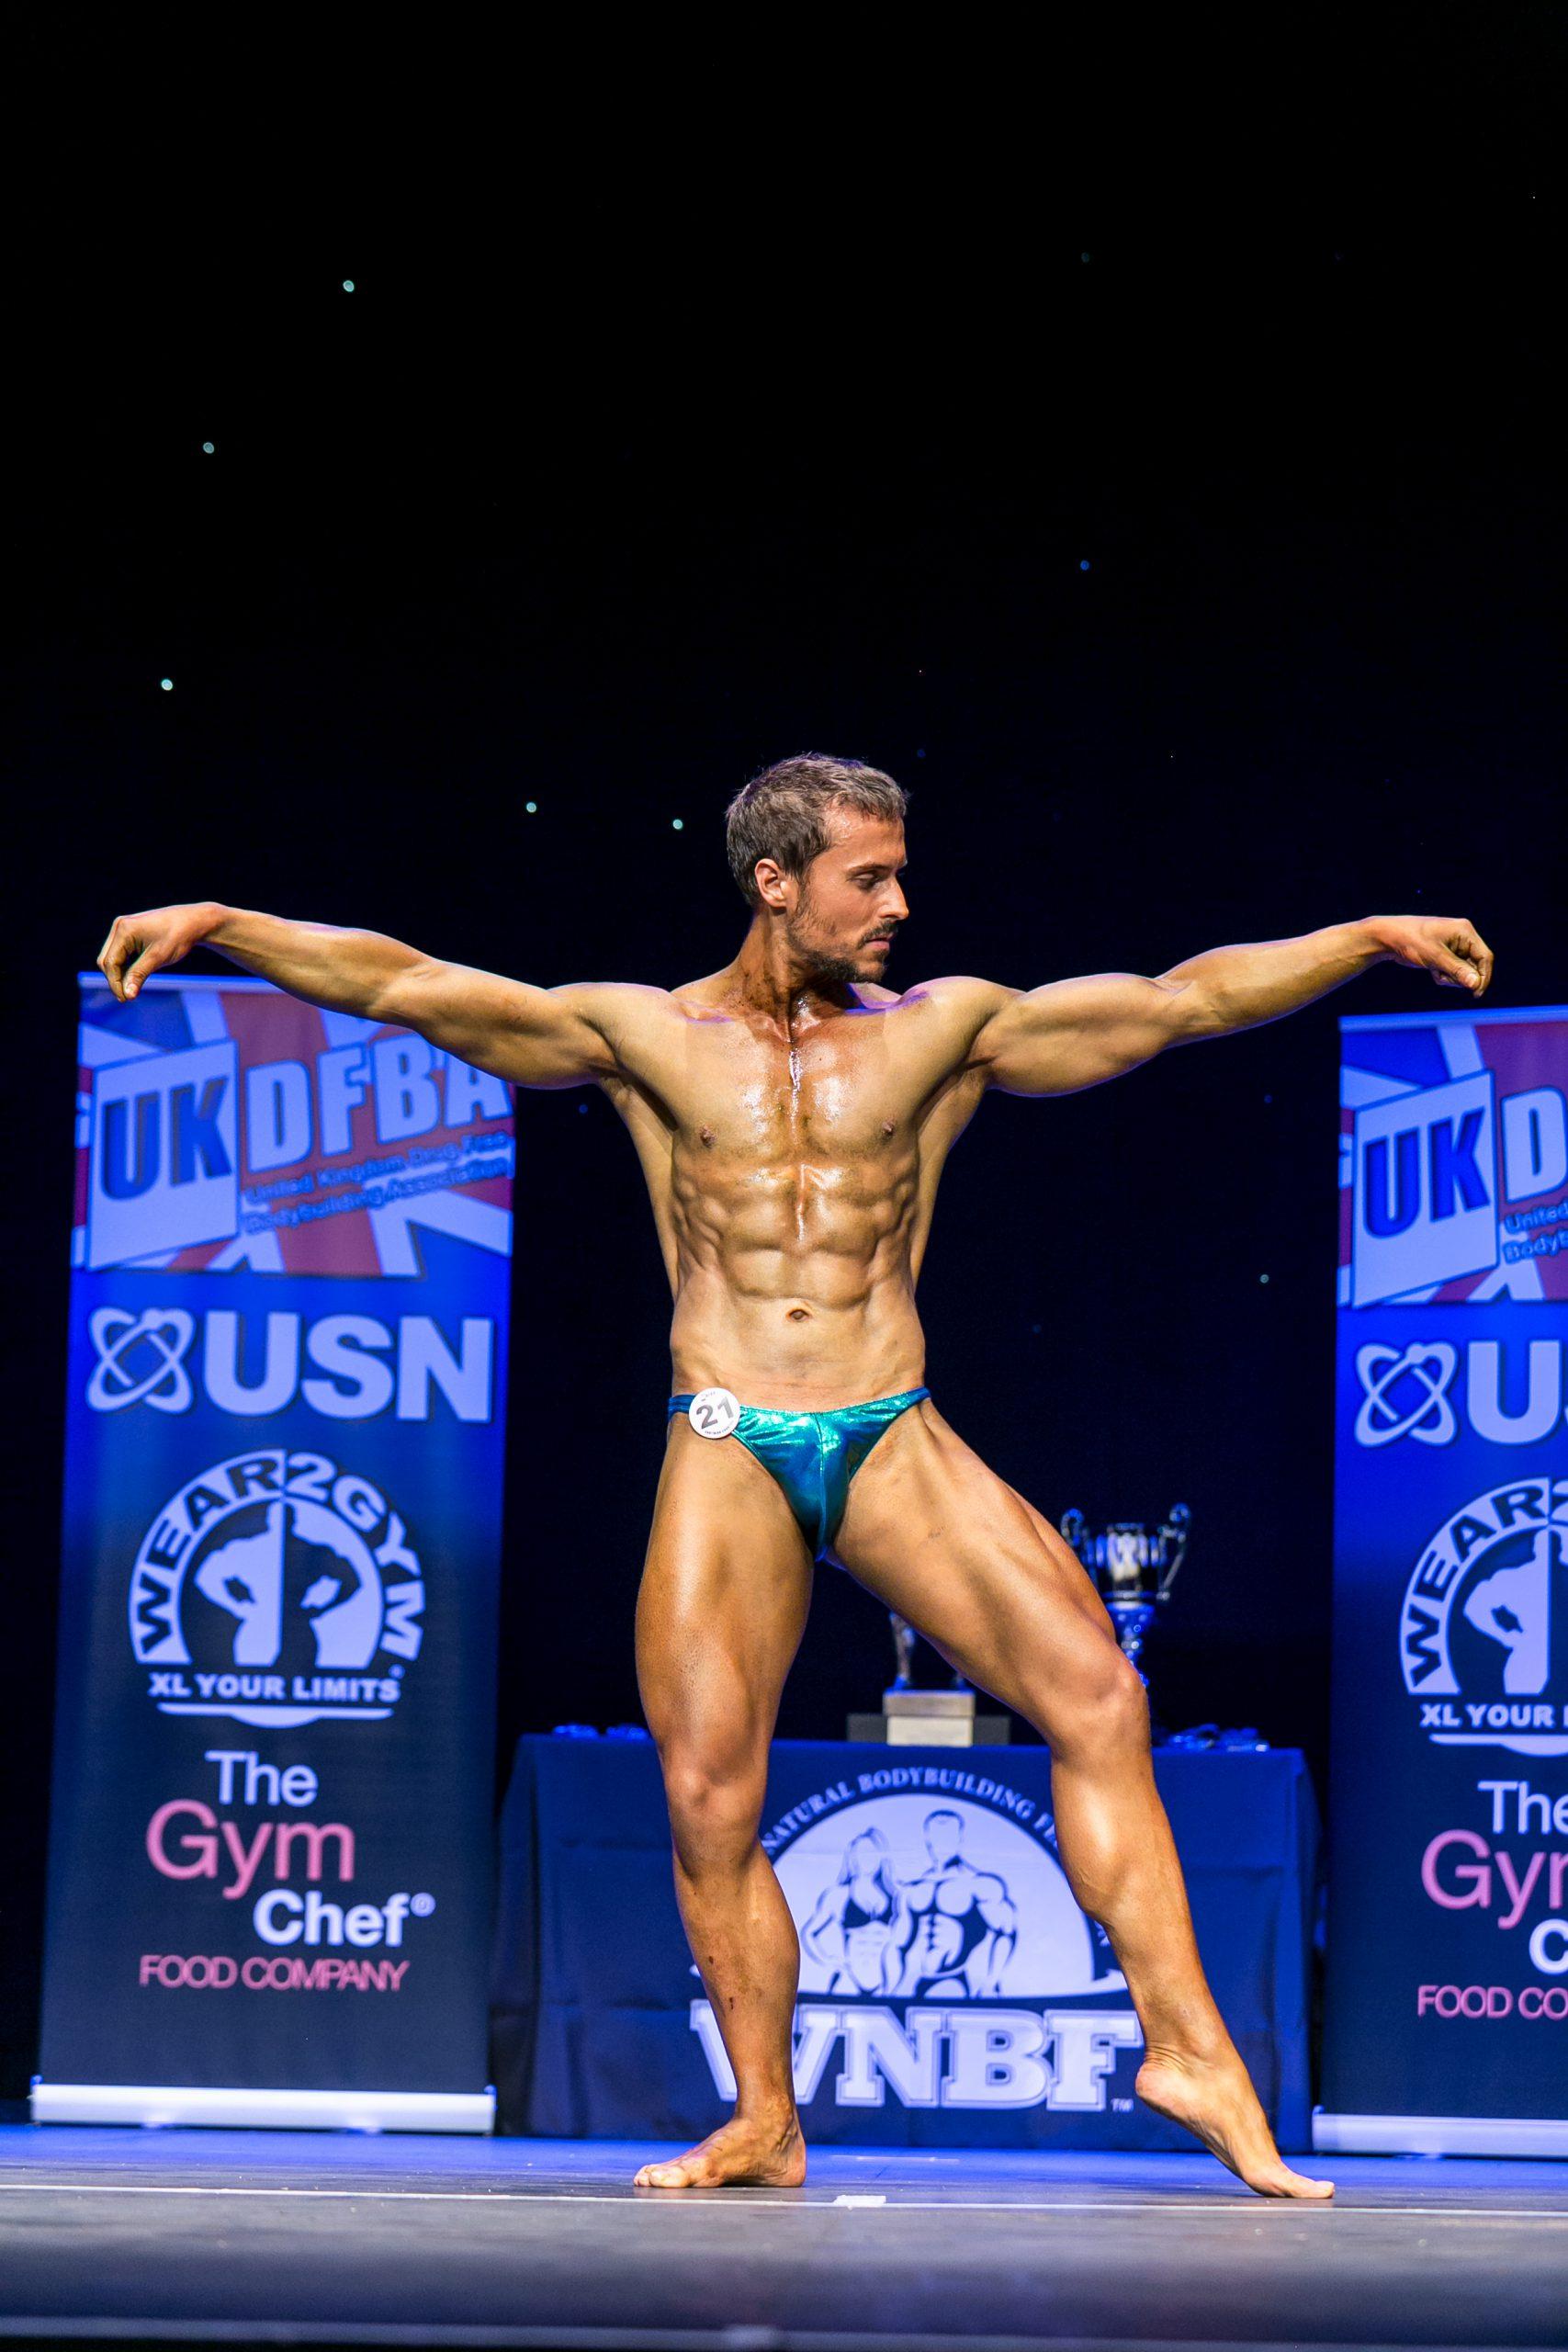 Meet Your Peak Body Coach - Steve Moreton